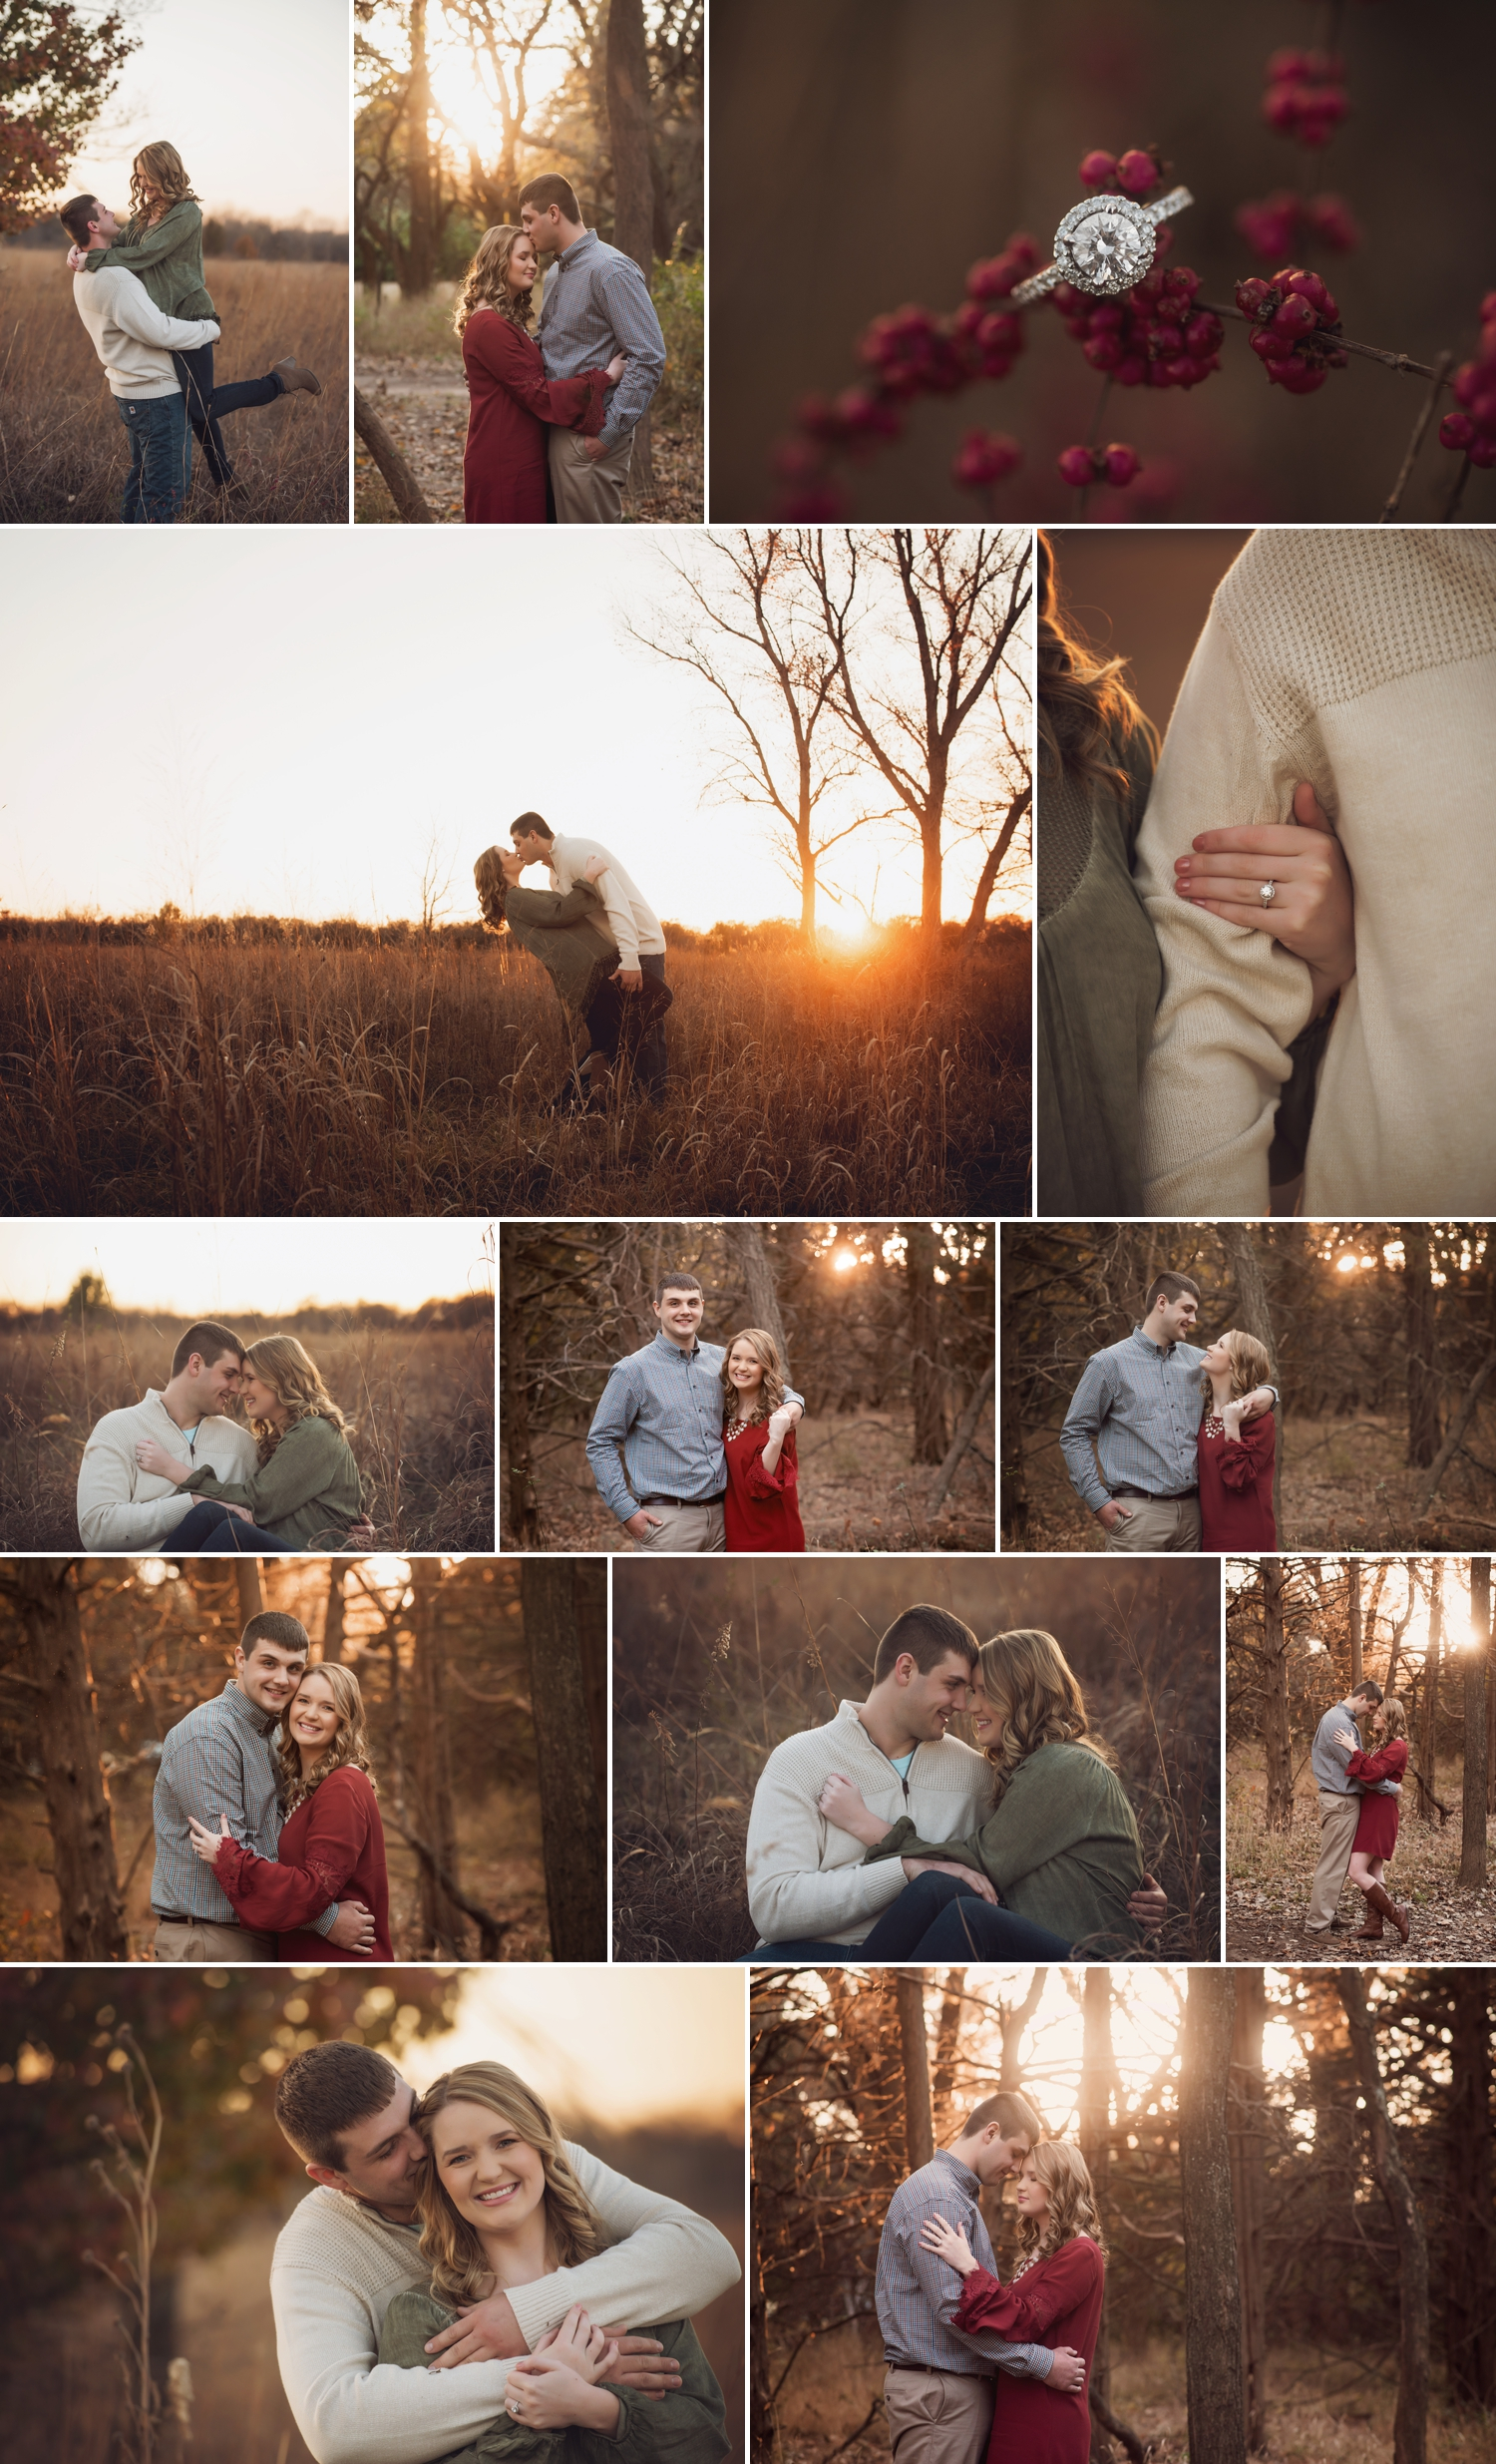 wichita-kansas-engagement-photography 1.jpg